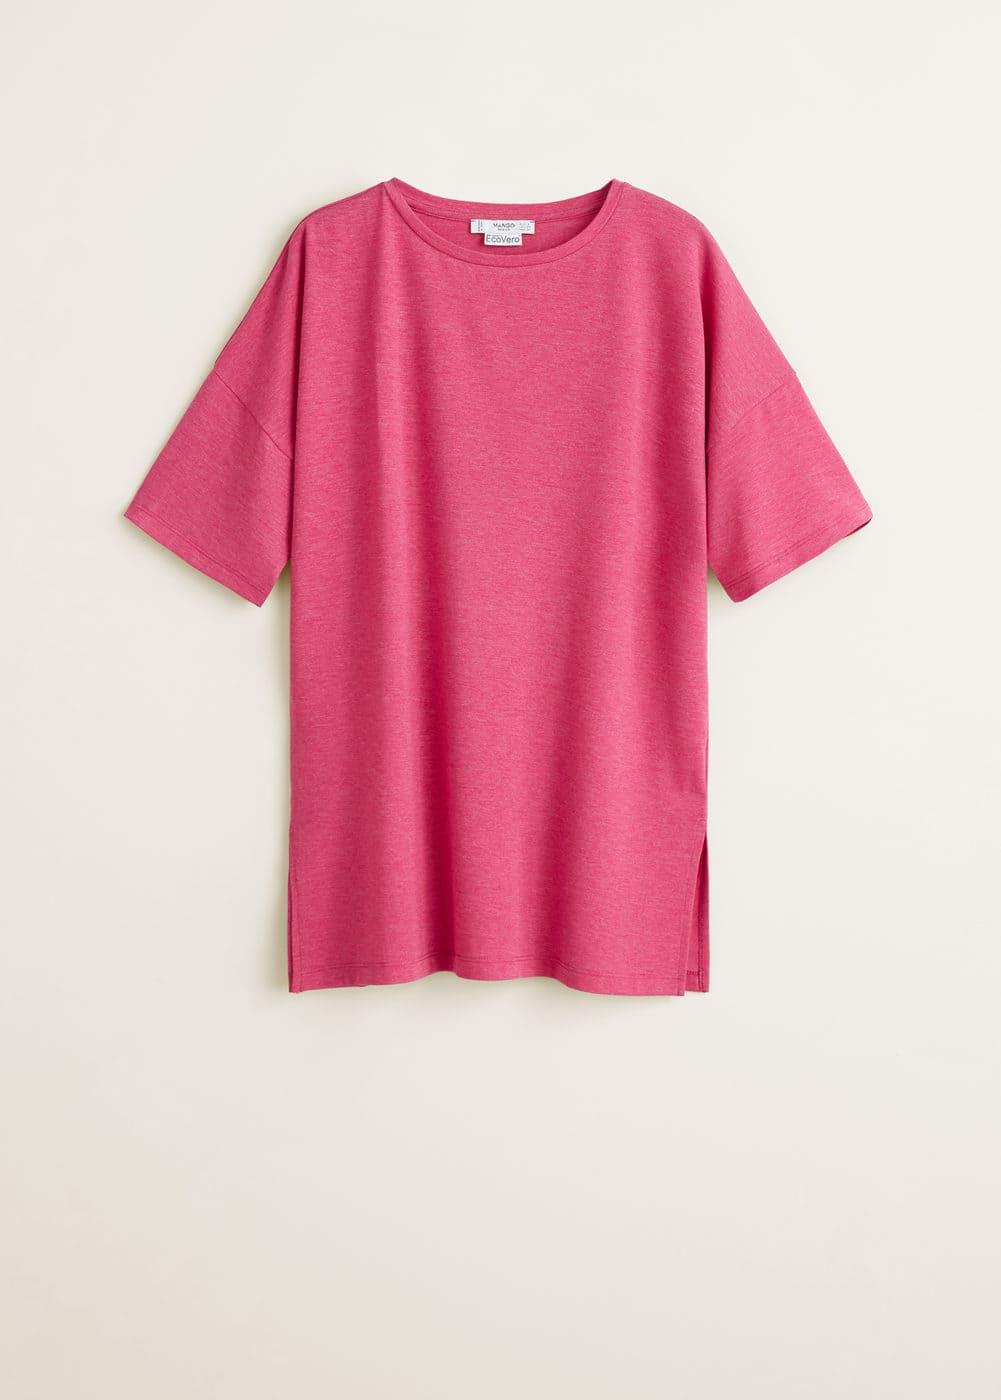 Mango - Camiseta básica - 6